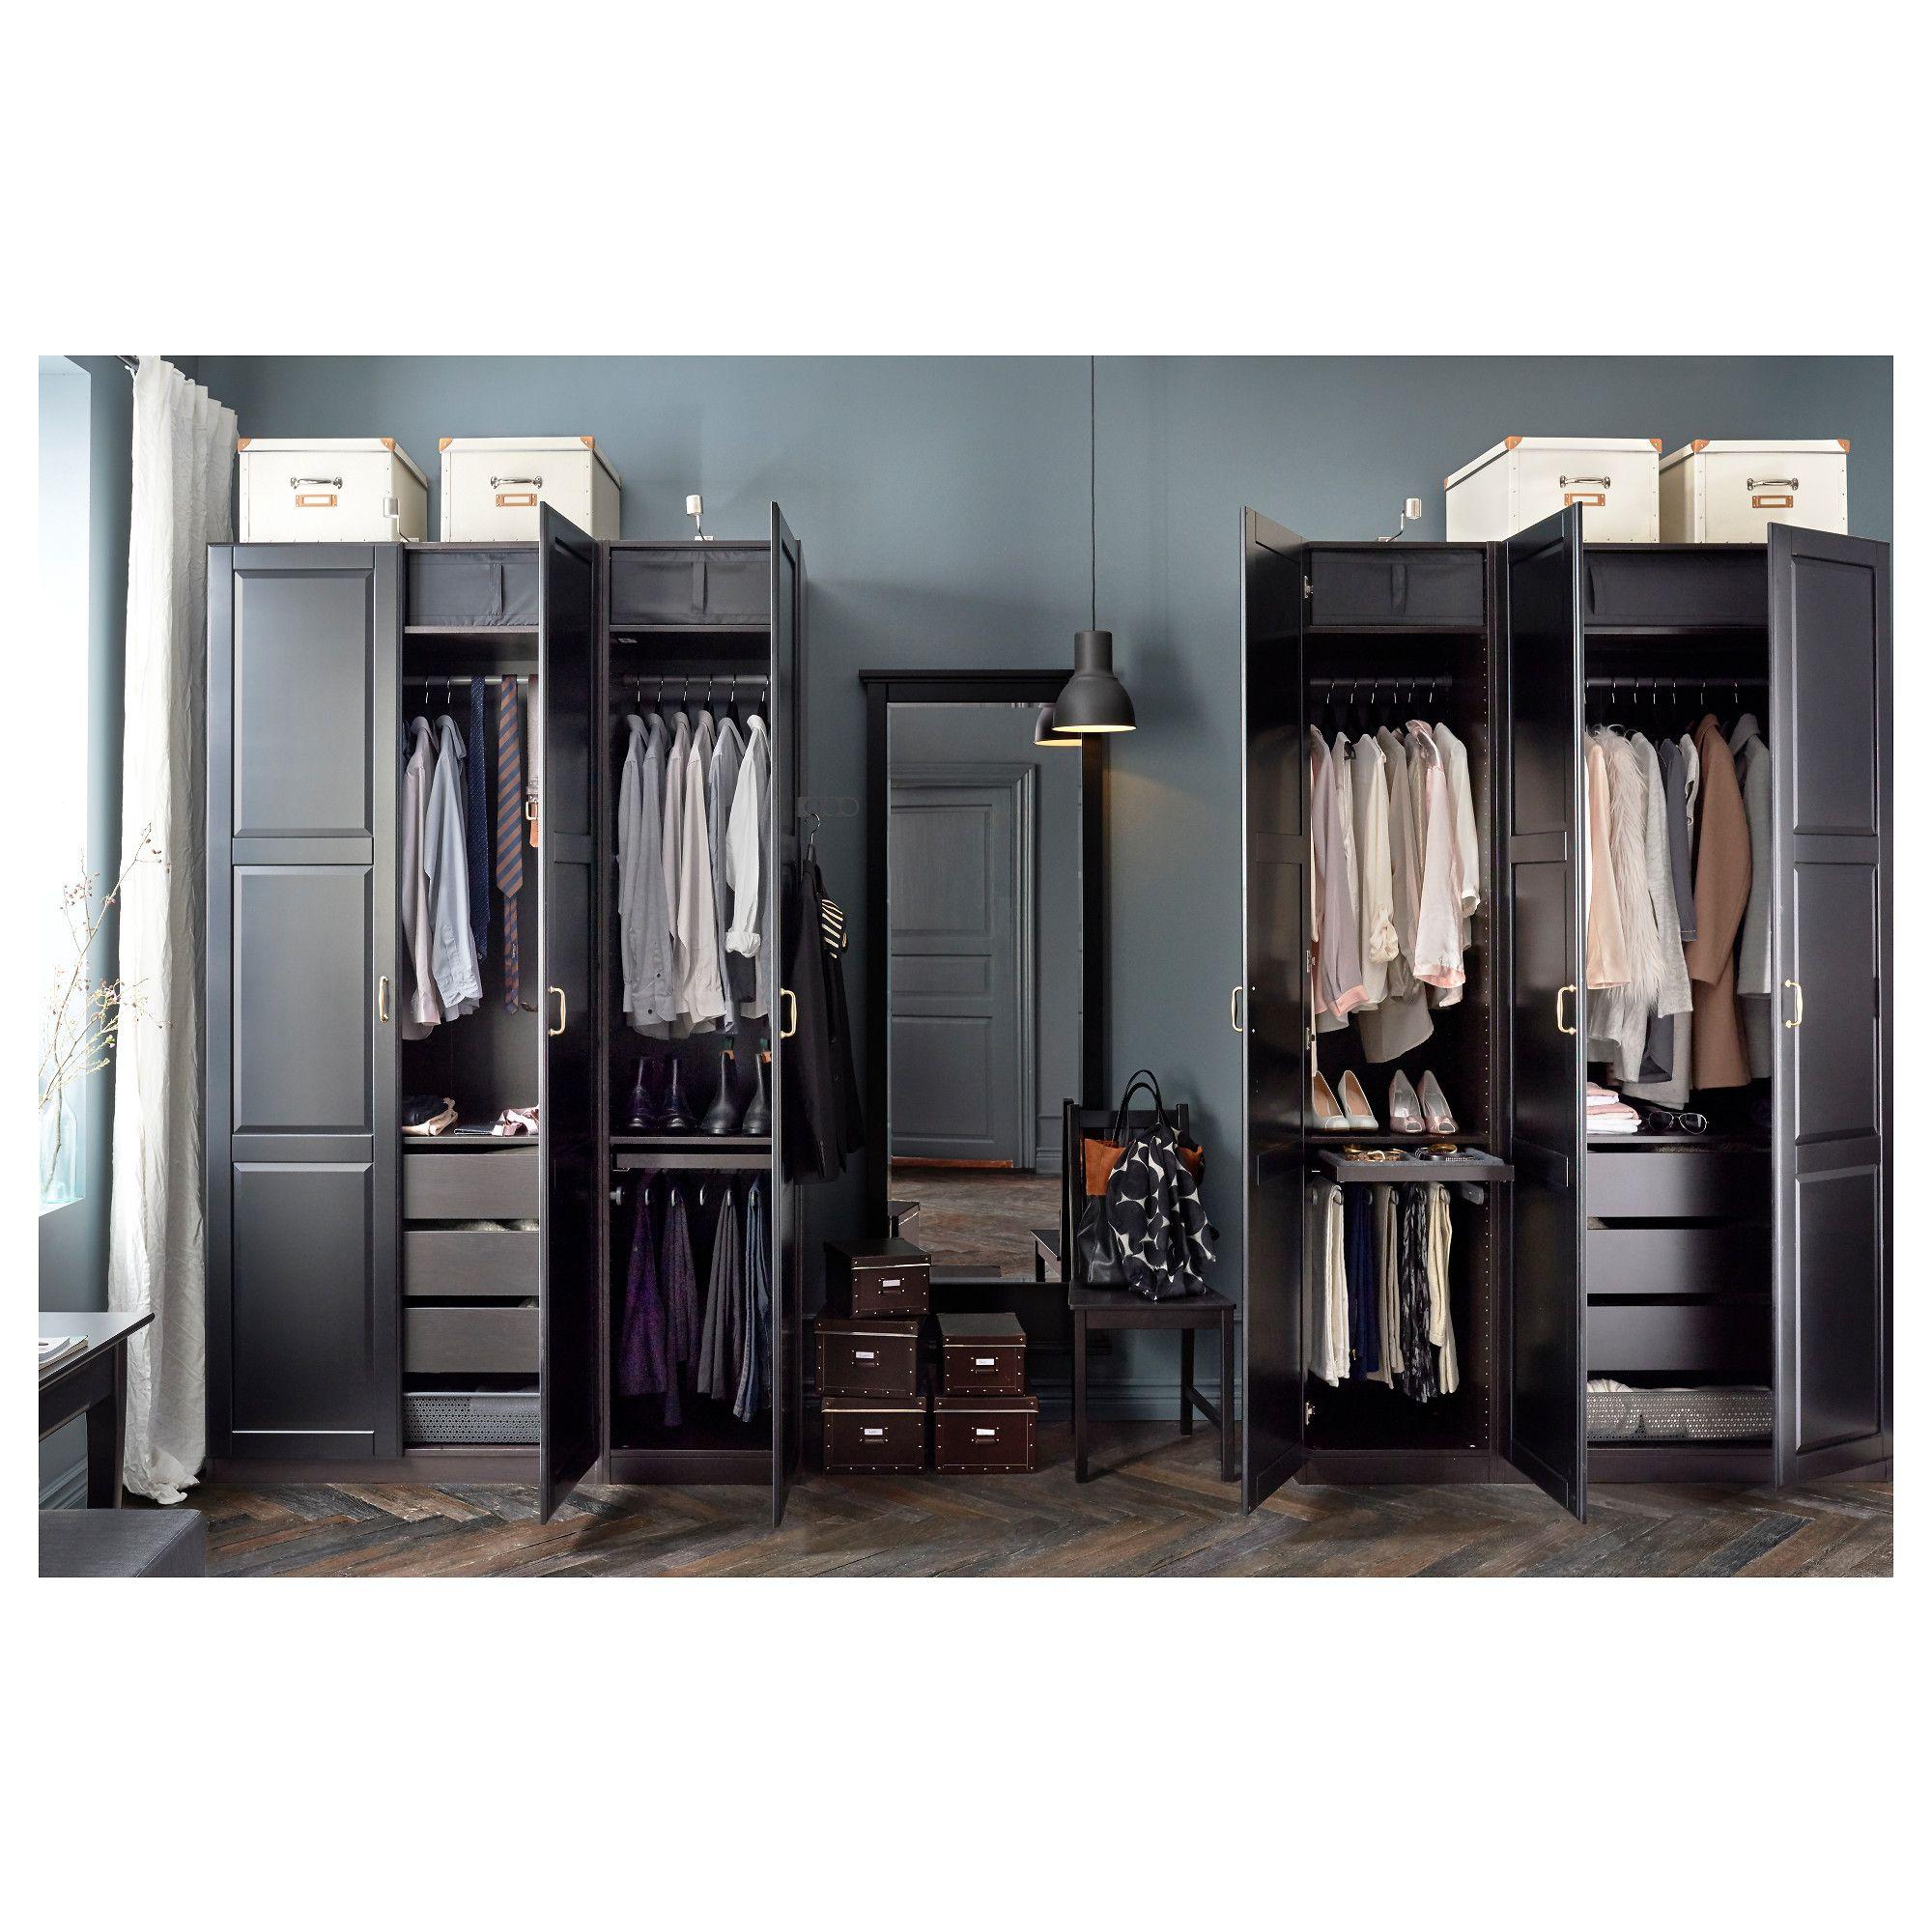 Pax Wardrobe Black Brown Undredal Black 59x23 3 4x93 1 8 Pax Wardrobe Ikea Wardrobe Ikea Wardrobe Hack